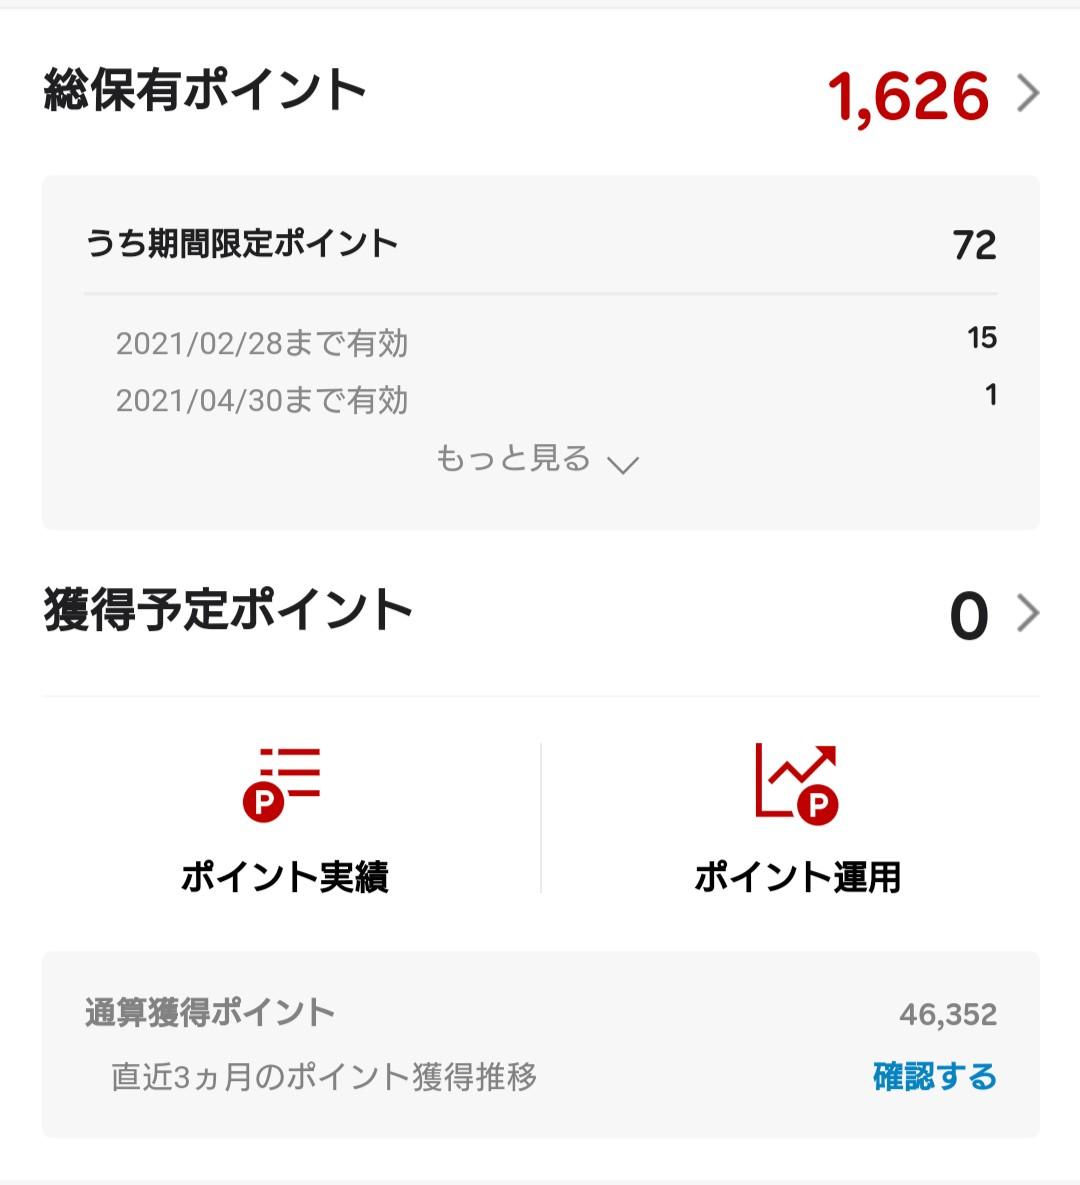 f:id:hinayuri2005:20210210235141j:plain